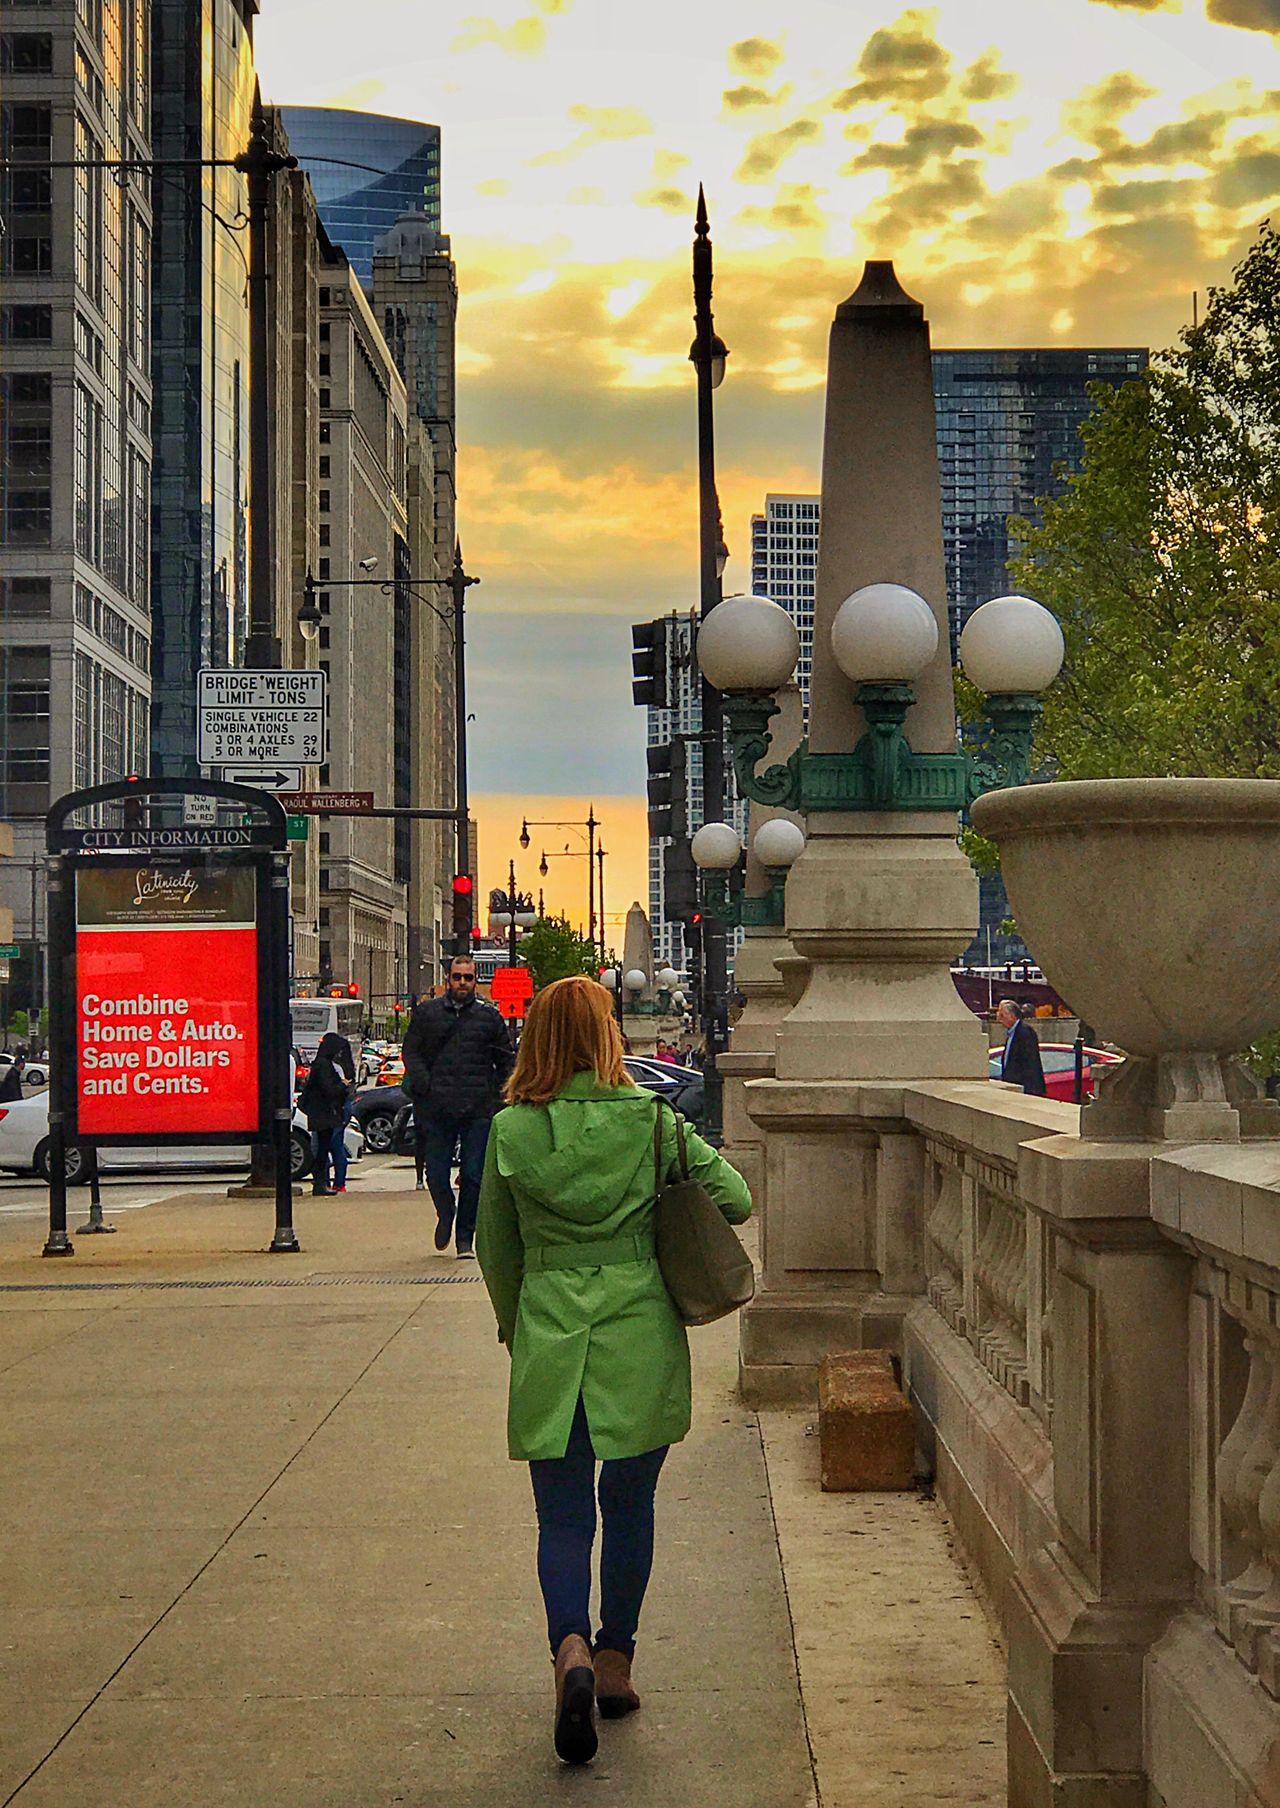 Golden Hour in the Chicago Loop Sunset 🌅 AArchitecture pPeople wWalking oOutdoors uUrban uUrbanphotography CCity LLove eExplore UUrban Exploration eEyeemurban EEyeEm Best Shots EEyeEm Gallery eEyeemphotography iIPhoneography The Street Photographer - 2017 EyeEm Awards